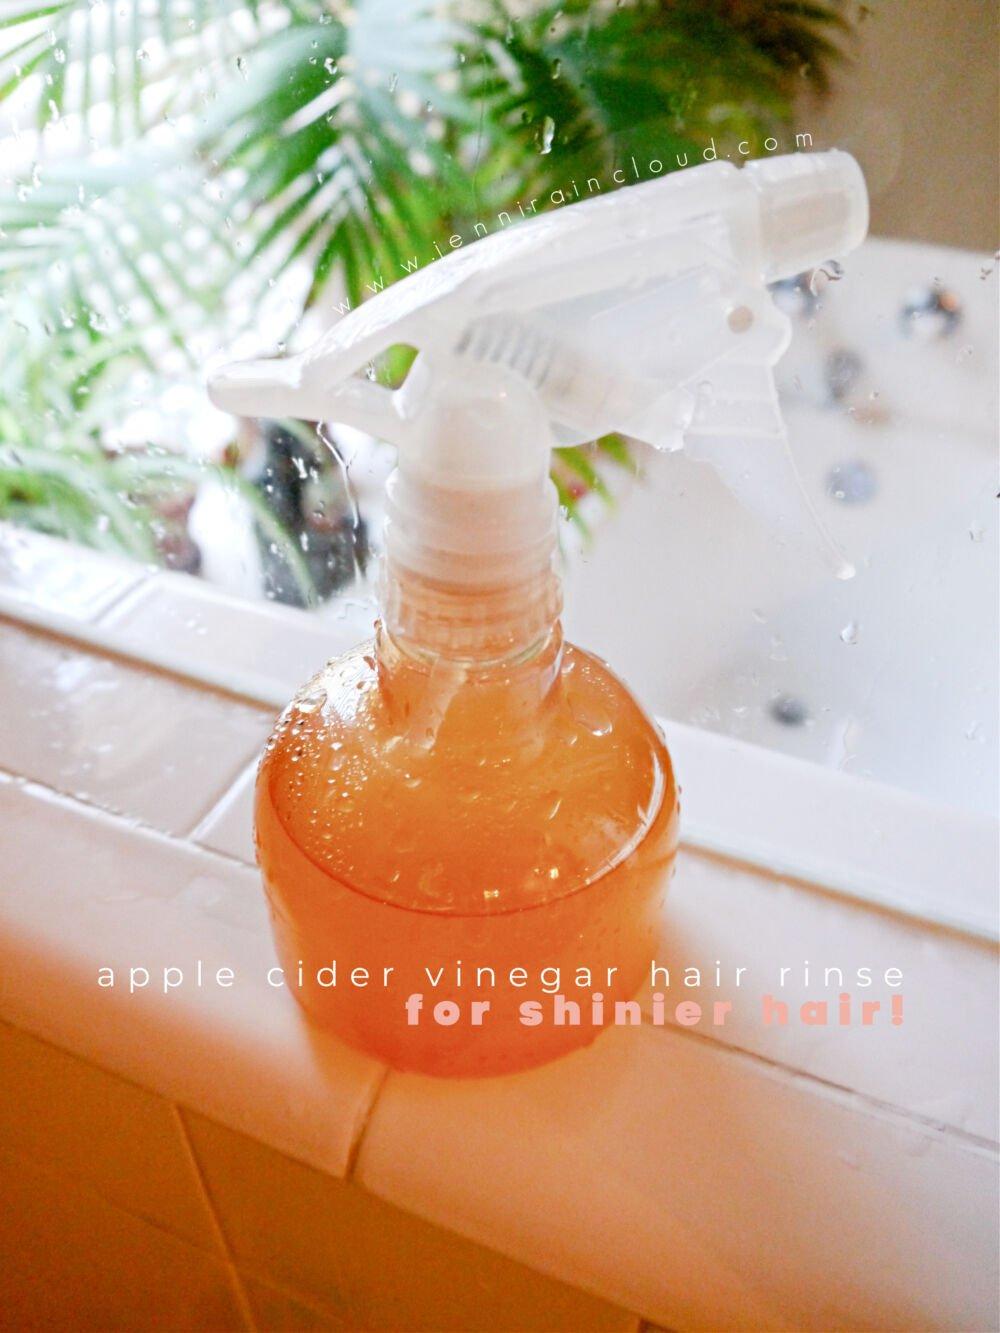 Apple Cider Vinegar Hair Rinse for Shiny Hair